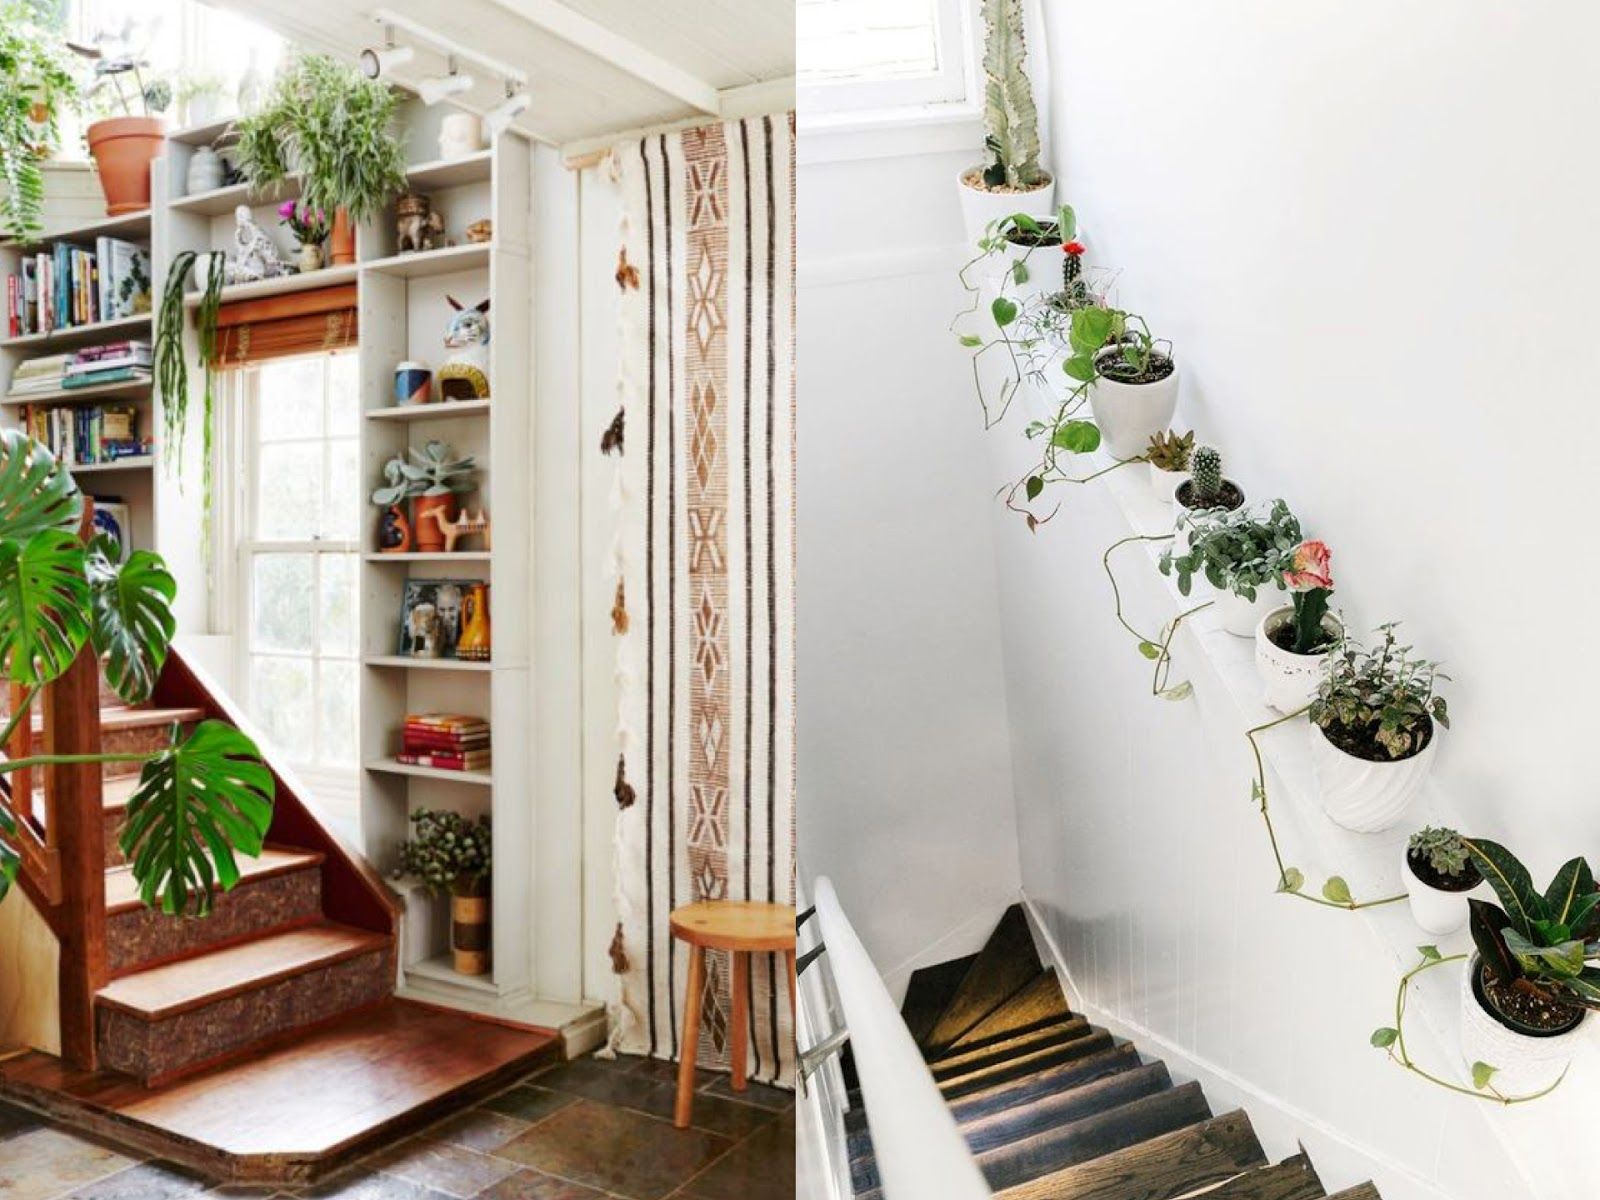 Amazing Cool Good Cuadros Para Subida Escaleras Elegant Stunning Ideas Para  Colgar With Decorar Subida De Escalera With Decorar Subida De Escalera With  ...